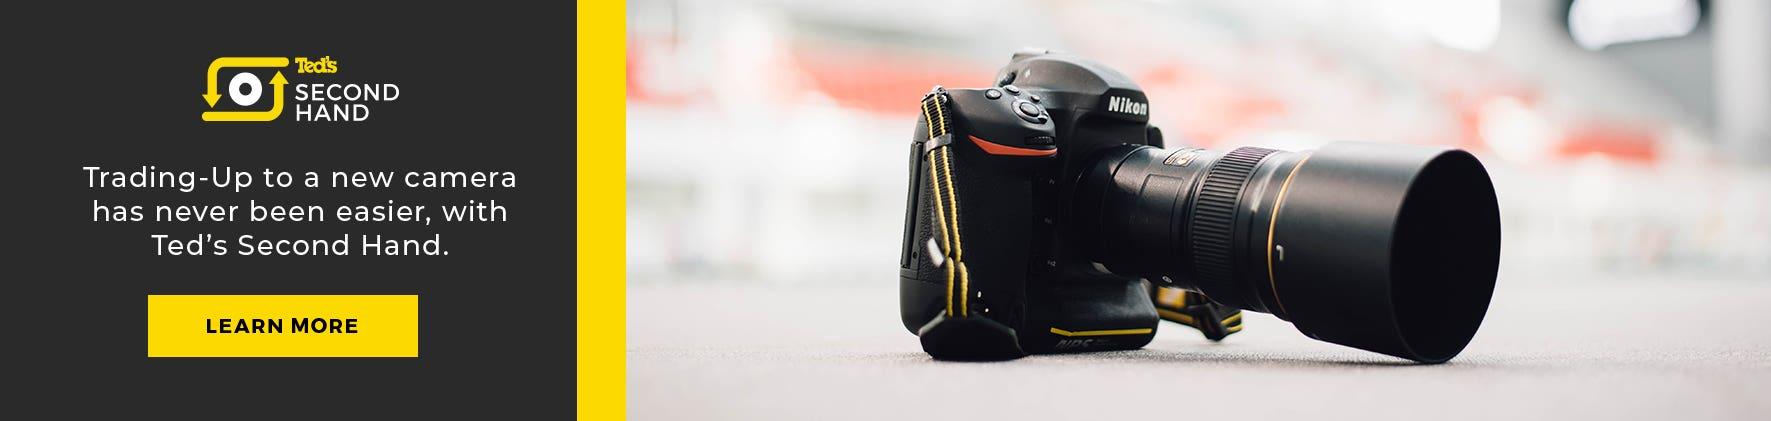 Secondhand Nikon